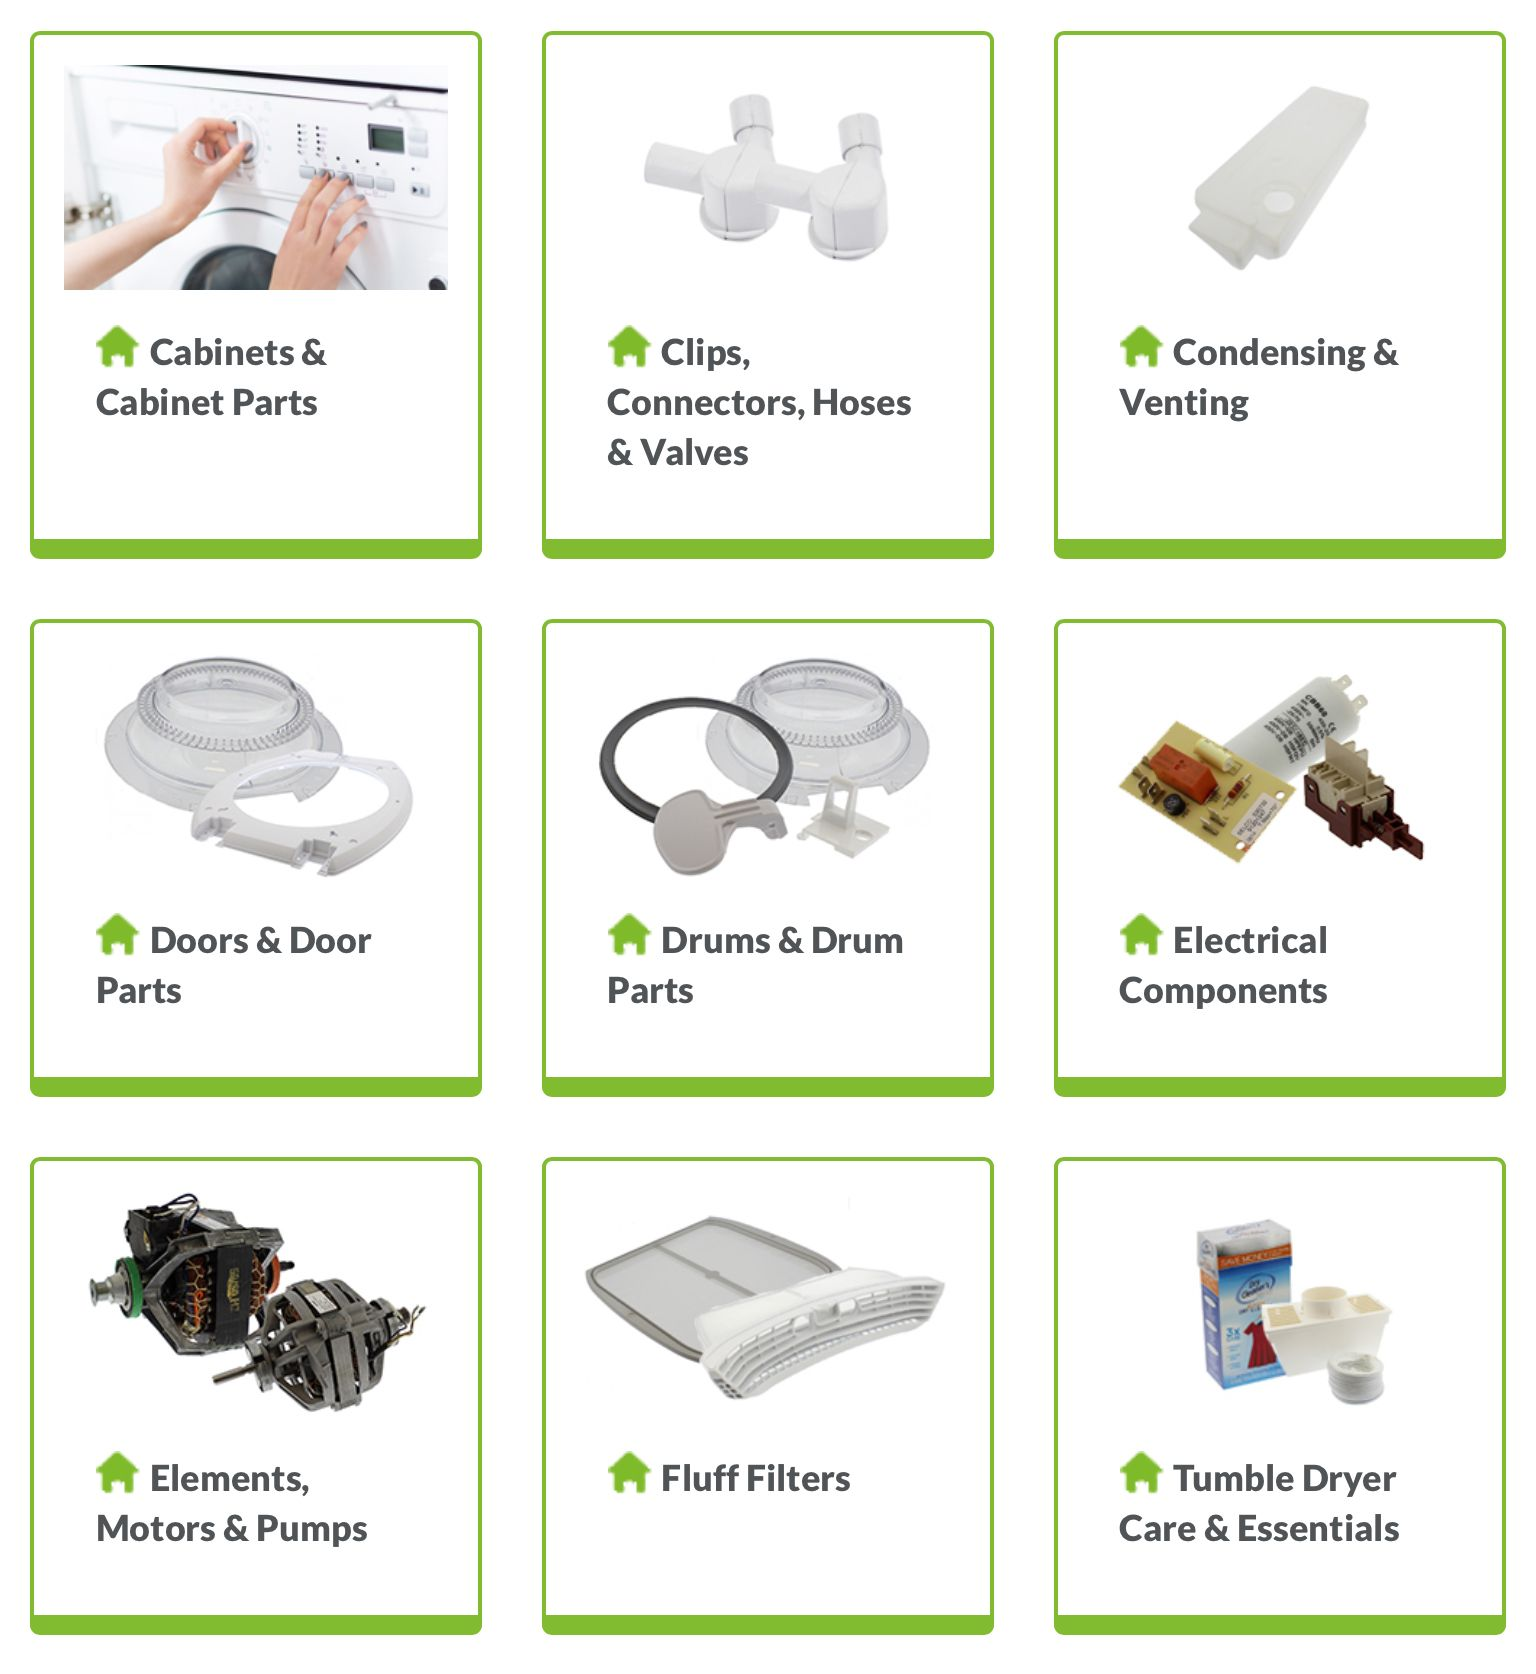 Tumble Dryer Spare Parts Tumble dryer, Dryer, Tumbling